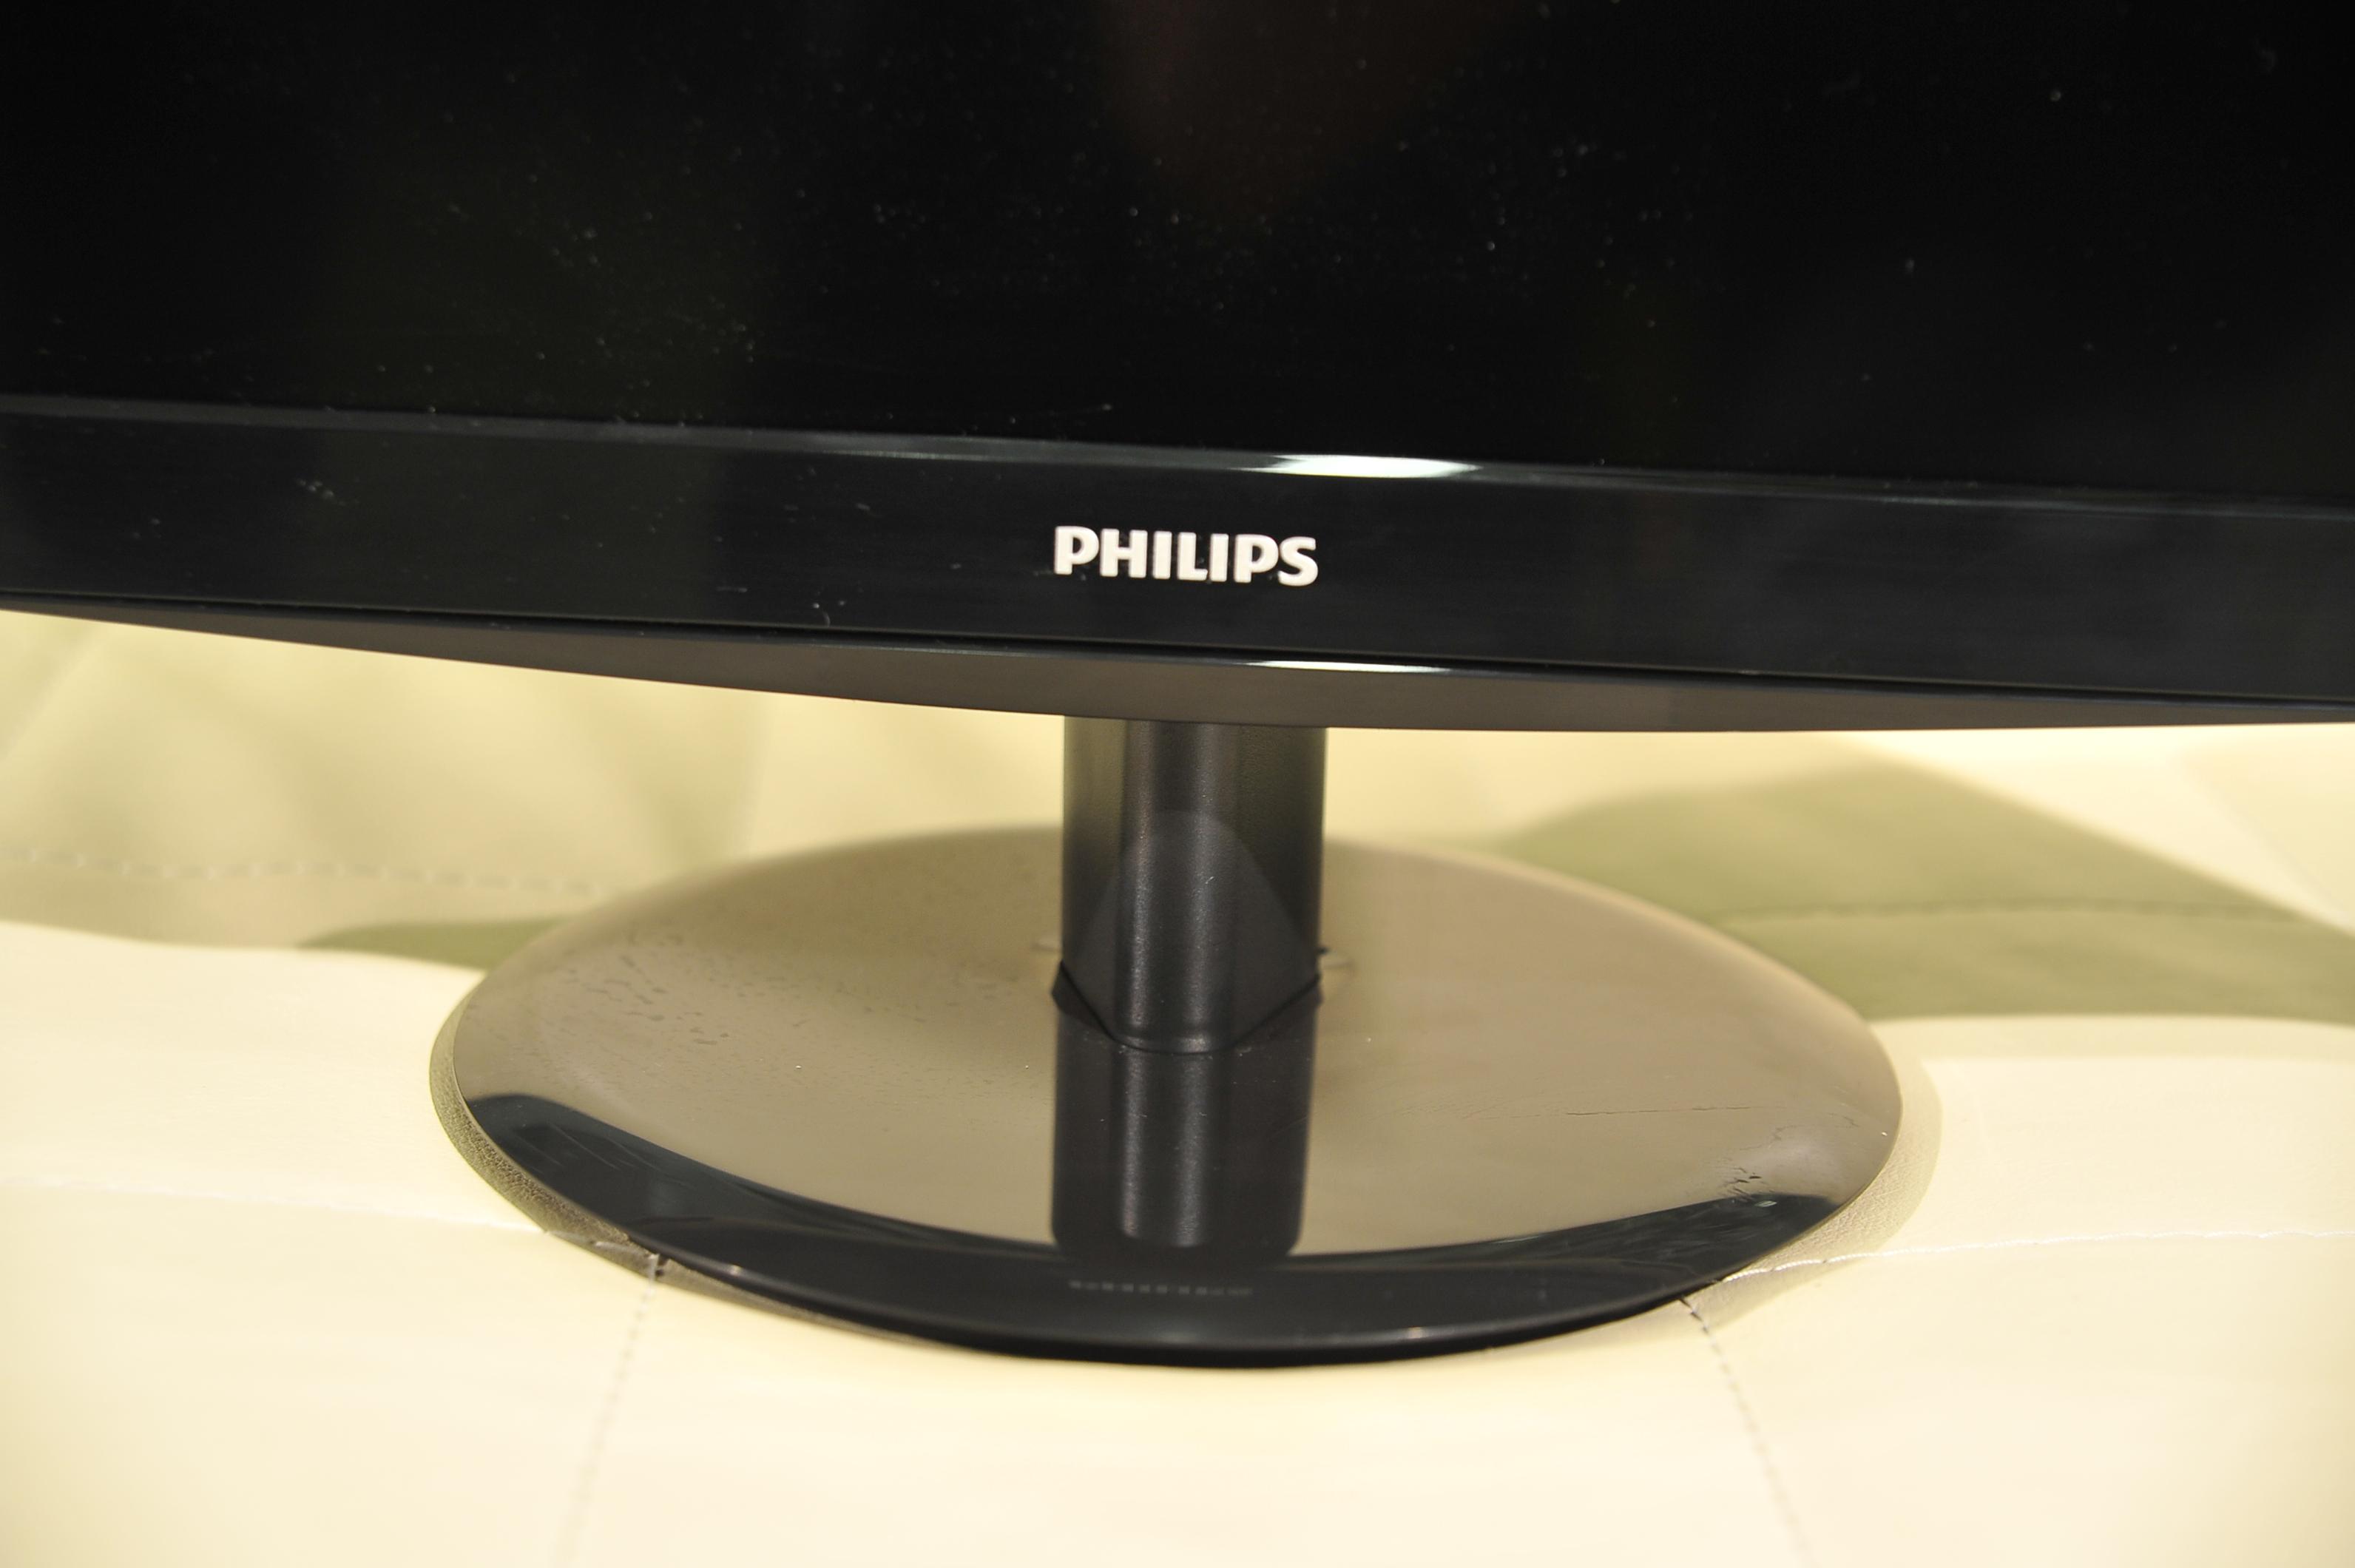 Philips G-line 236G3DH - подставка, хотелось бы больше свободы